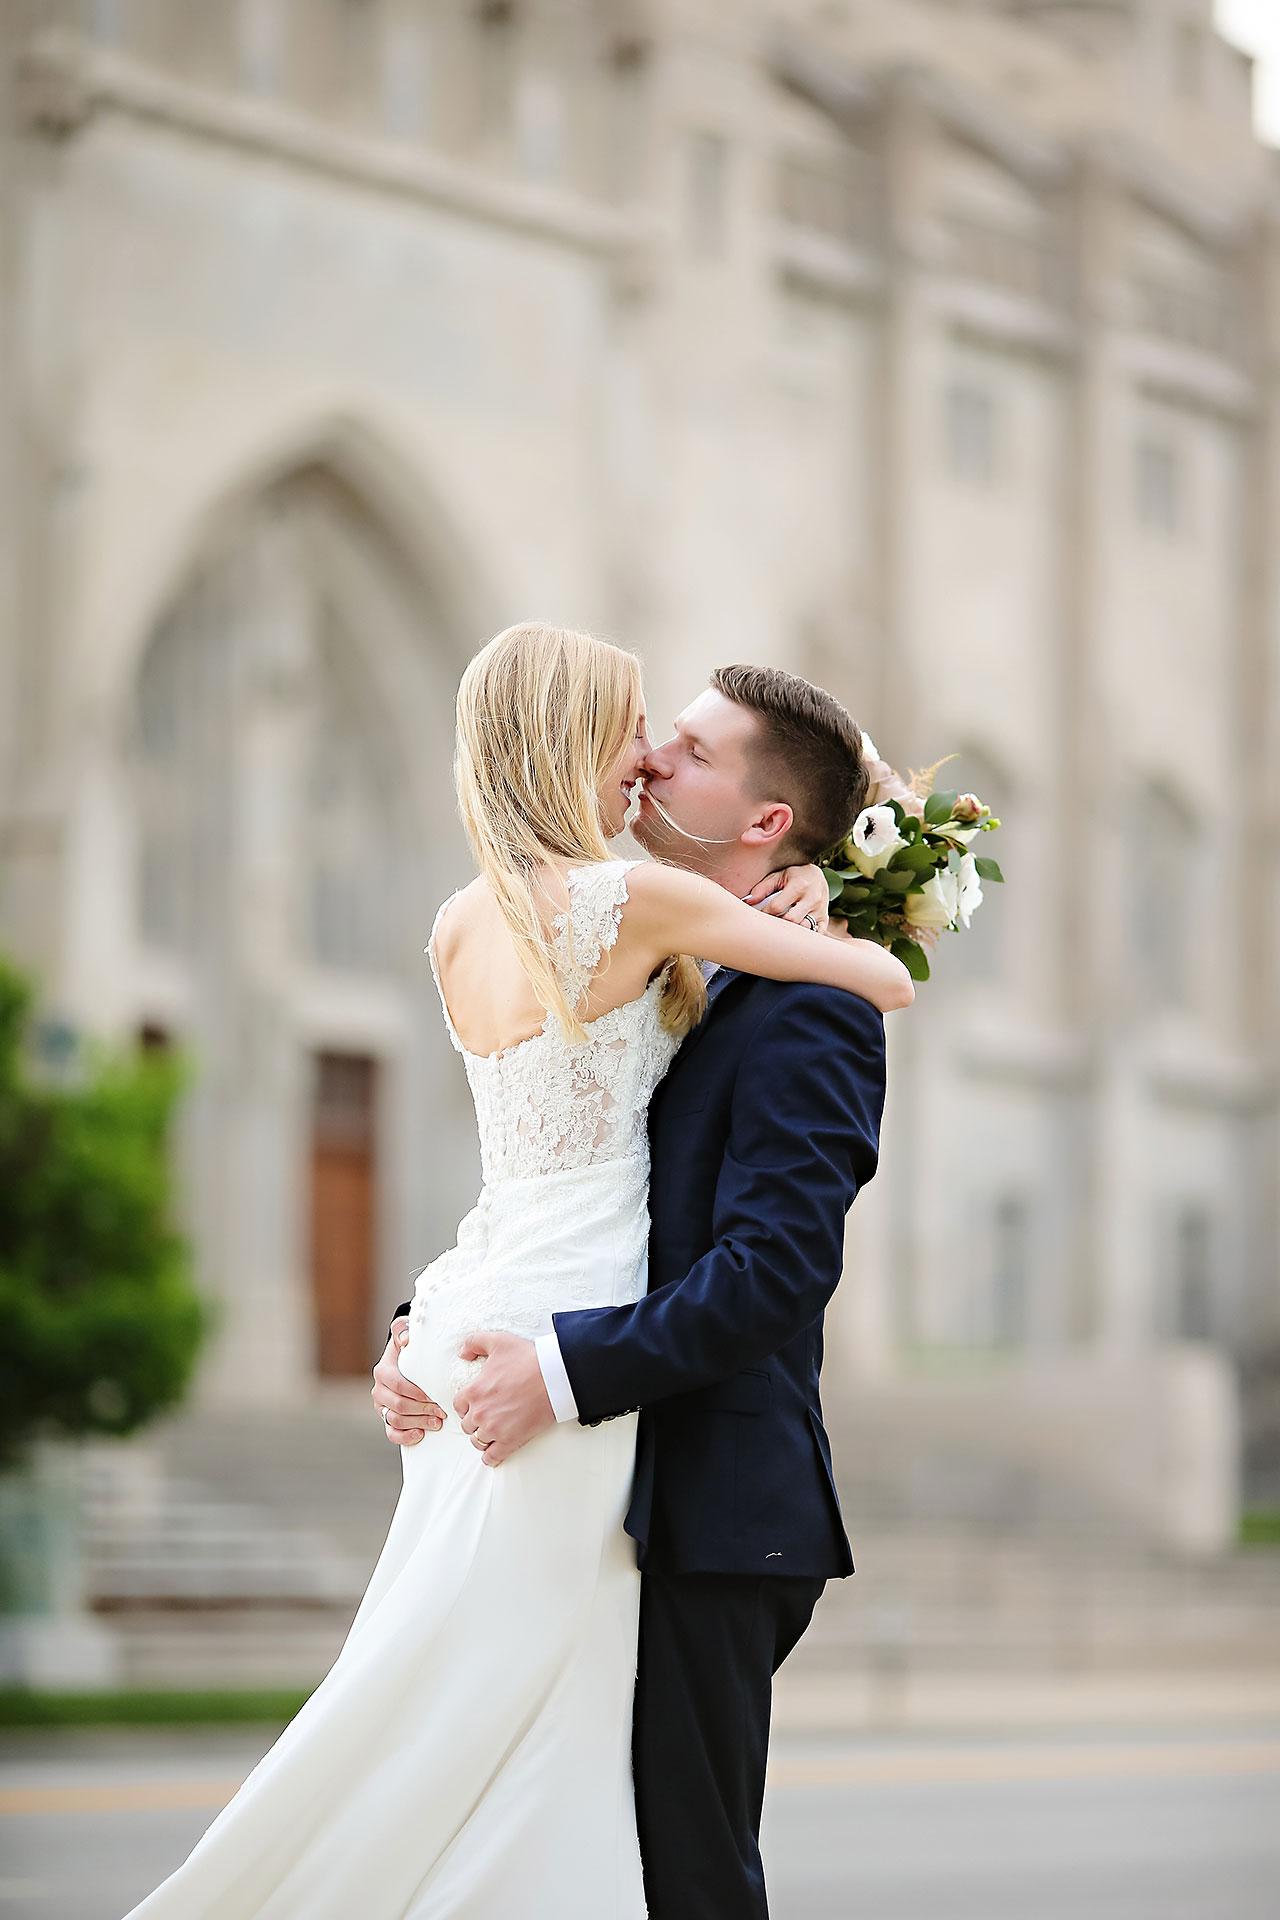 Molly Declan Scottish Rite Indianapolis Wedding 240